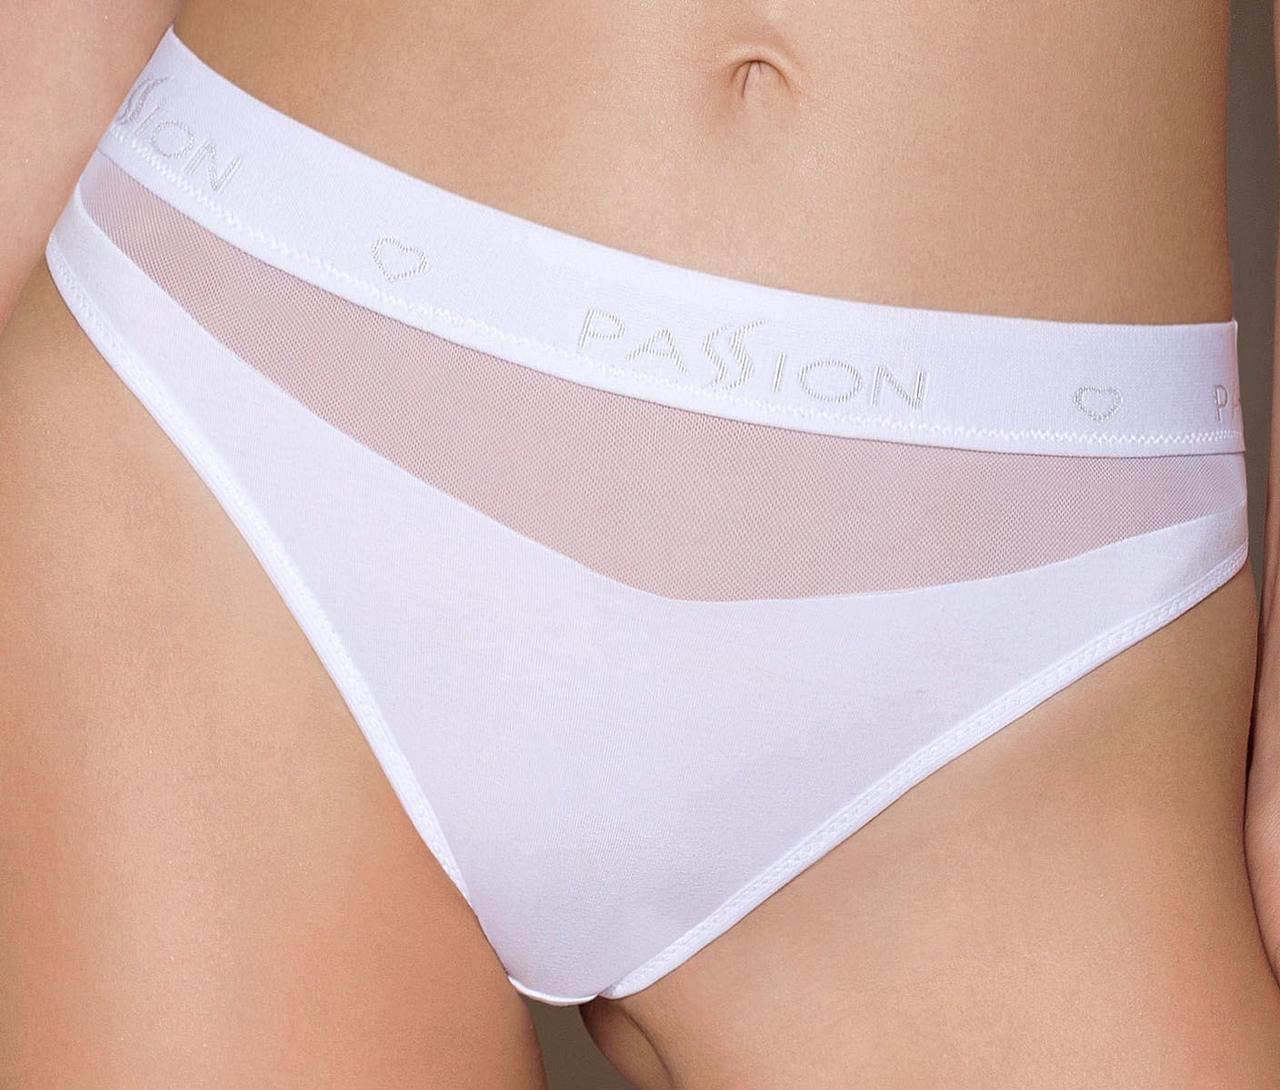 Трусики с прозрачной вставкой Passion PS006 PANTIES white, size XL